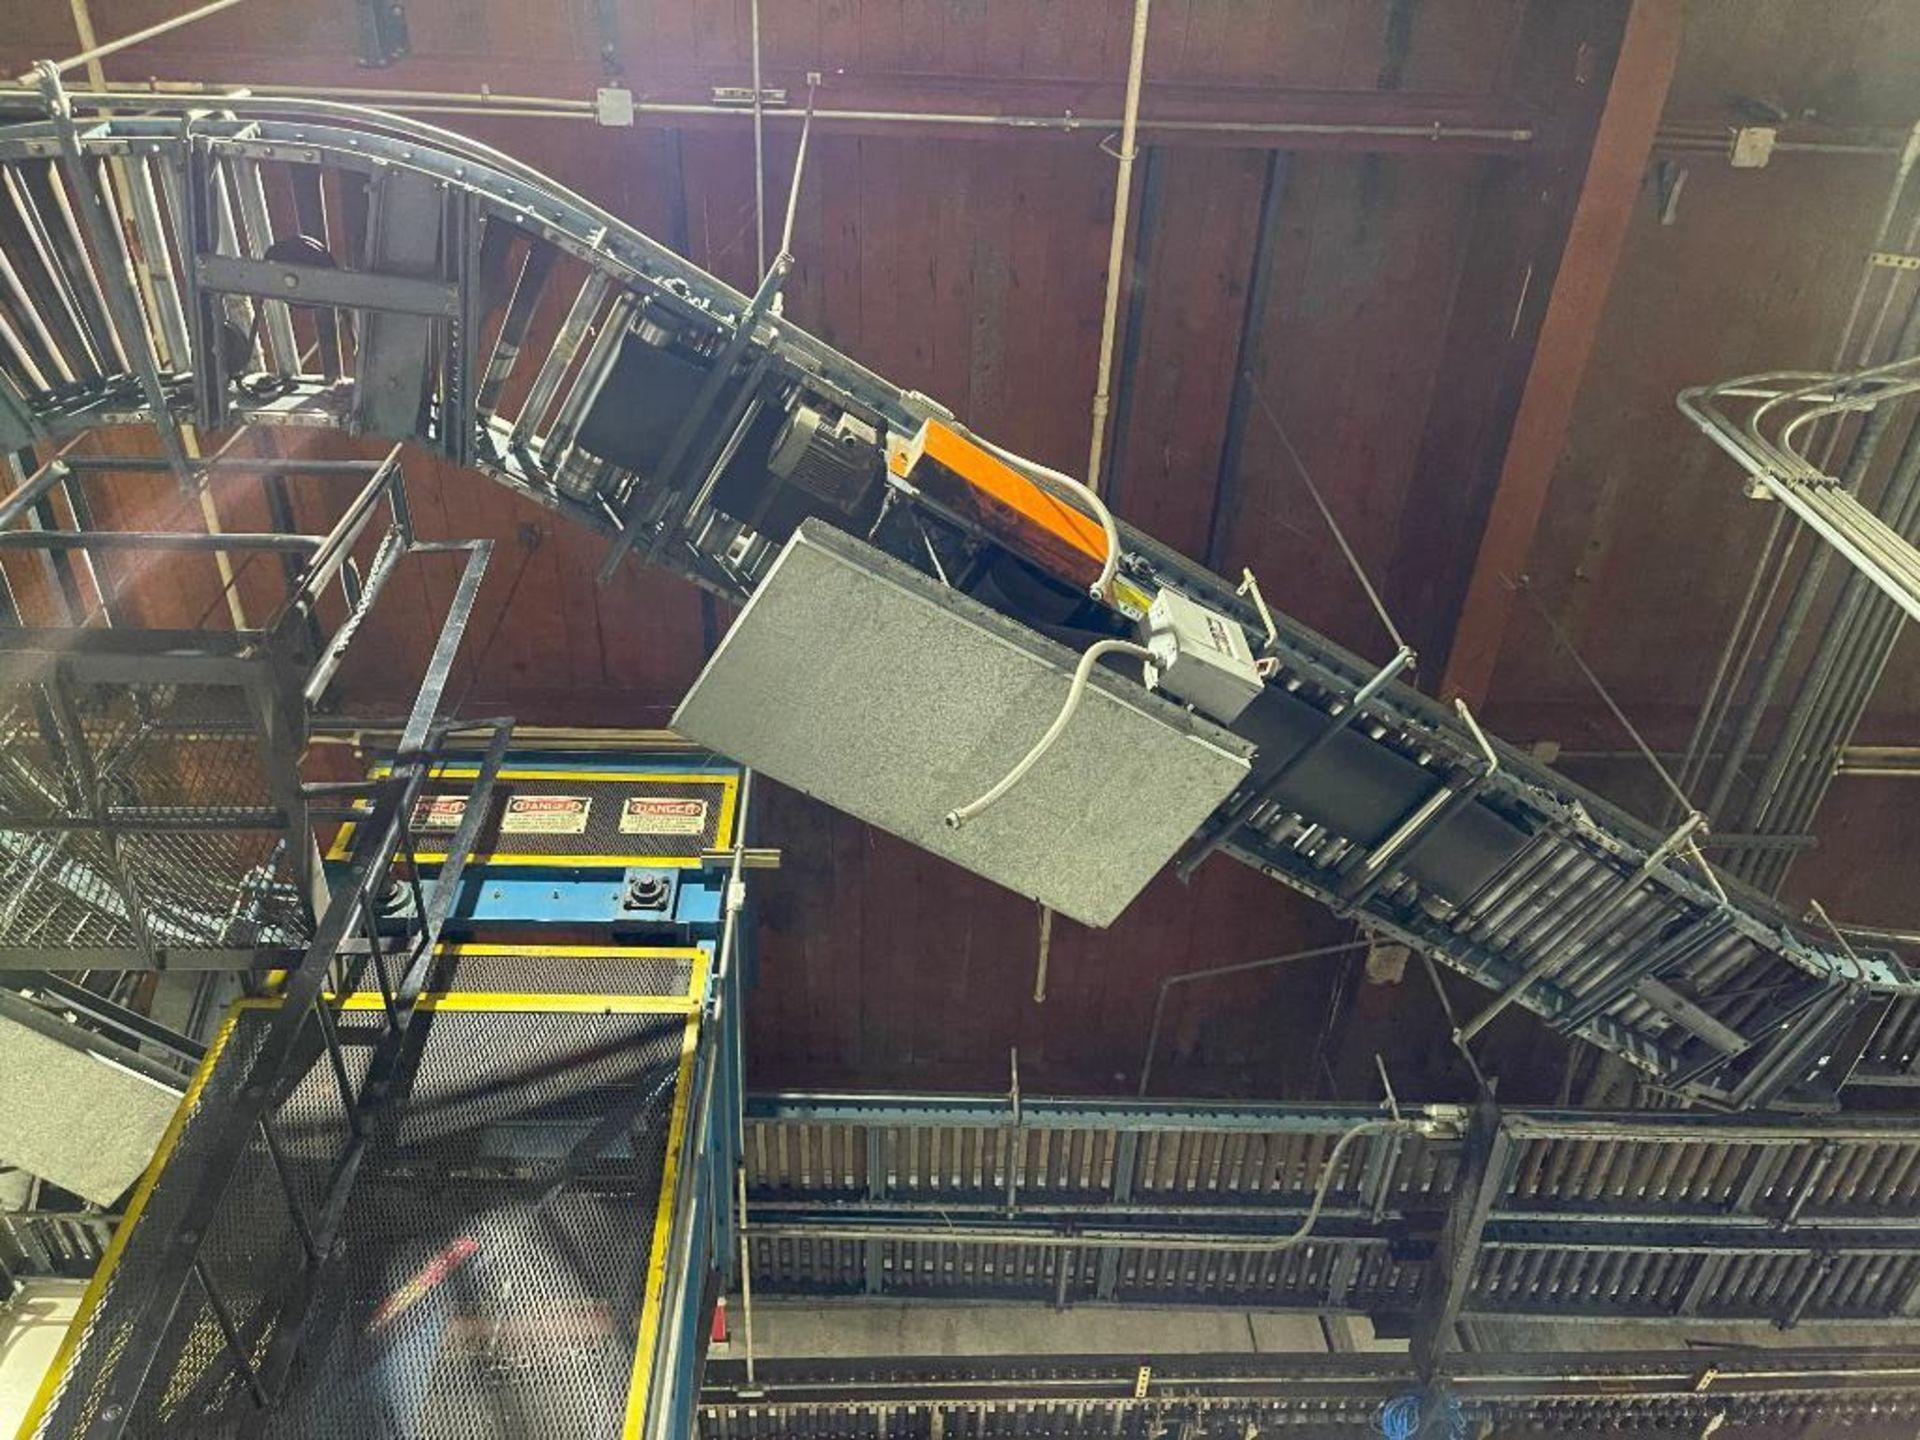 overhead power case conveyor - Image 2 of 9